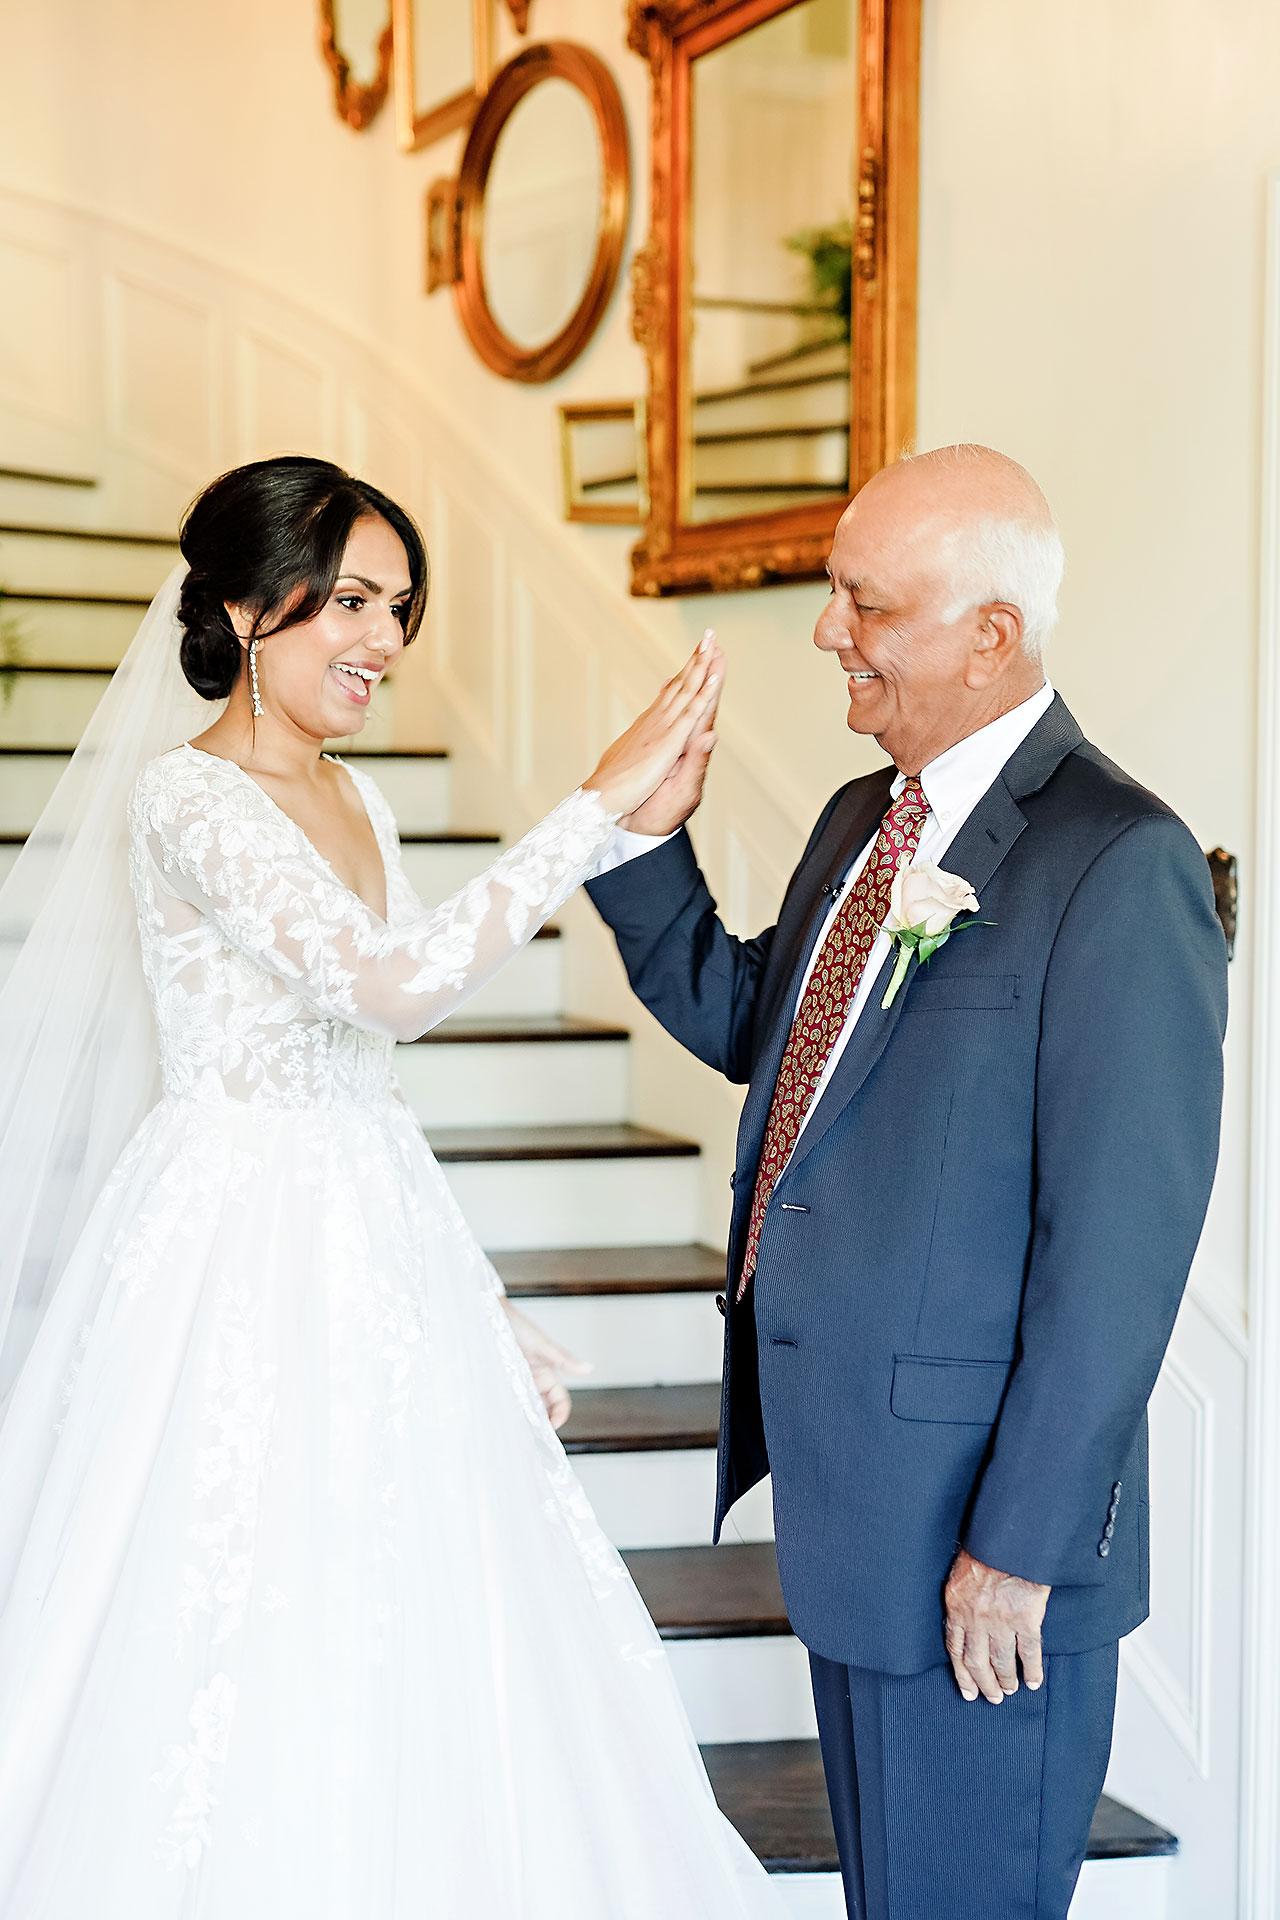 Nadia Parker Black Iris Estate Carmel Indiana Wedding May 2021 131